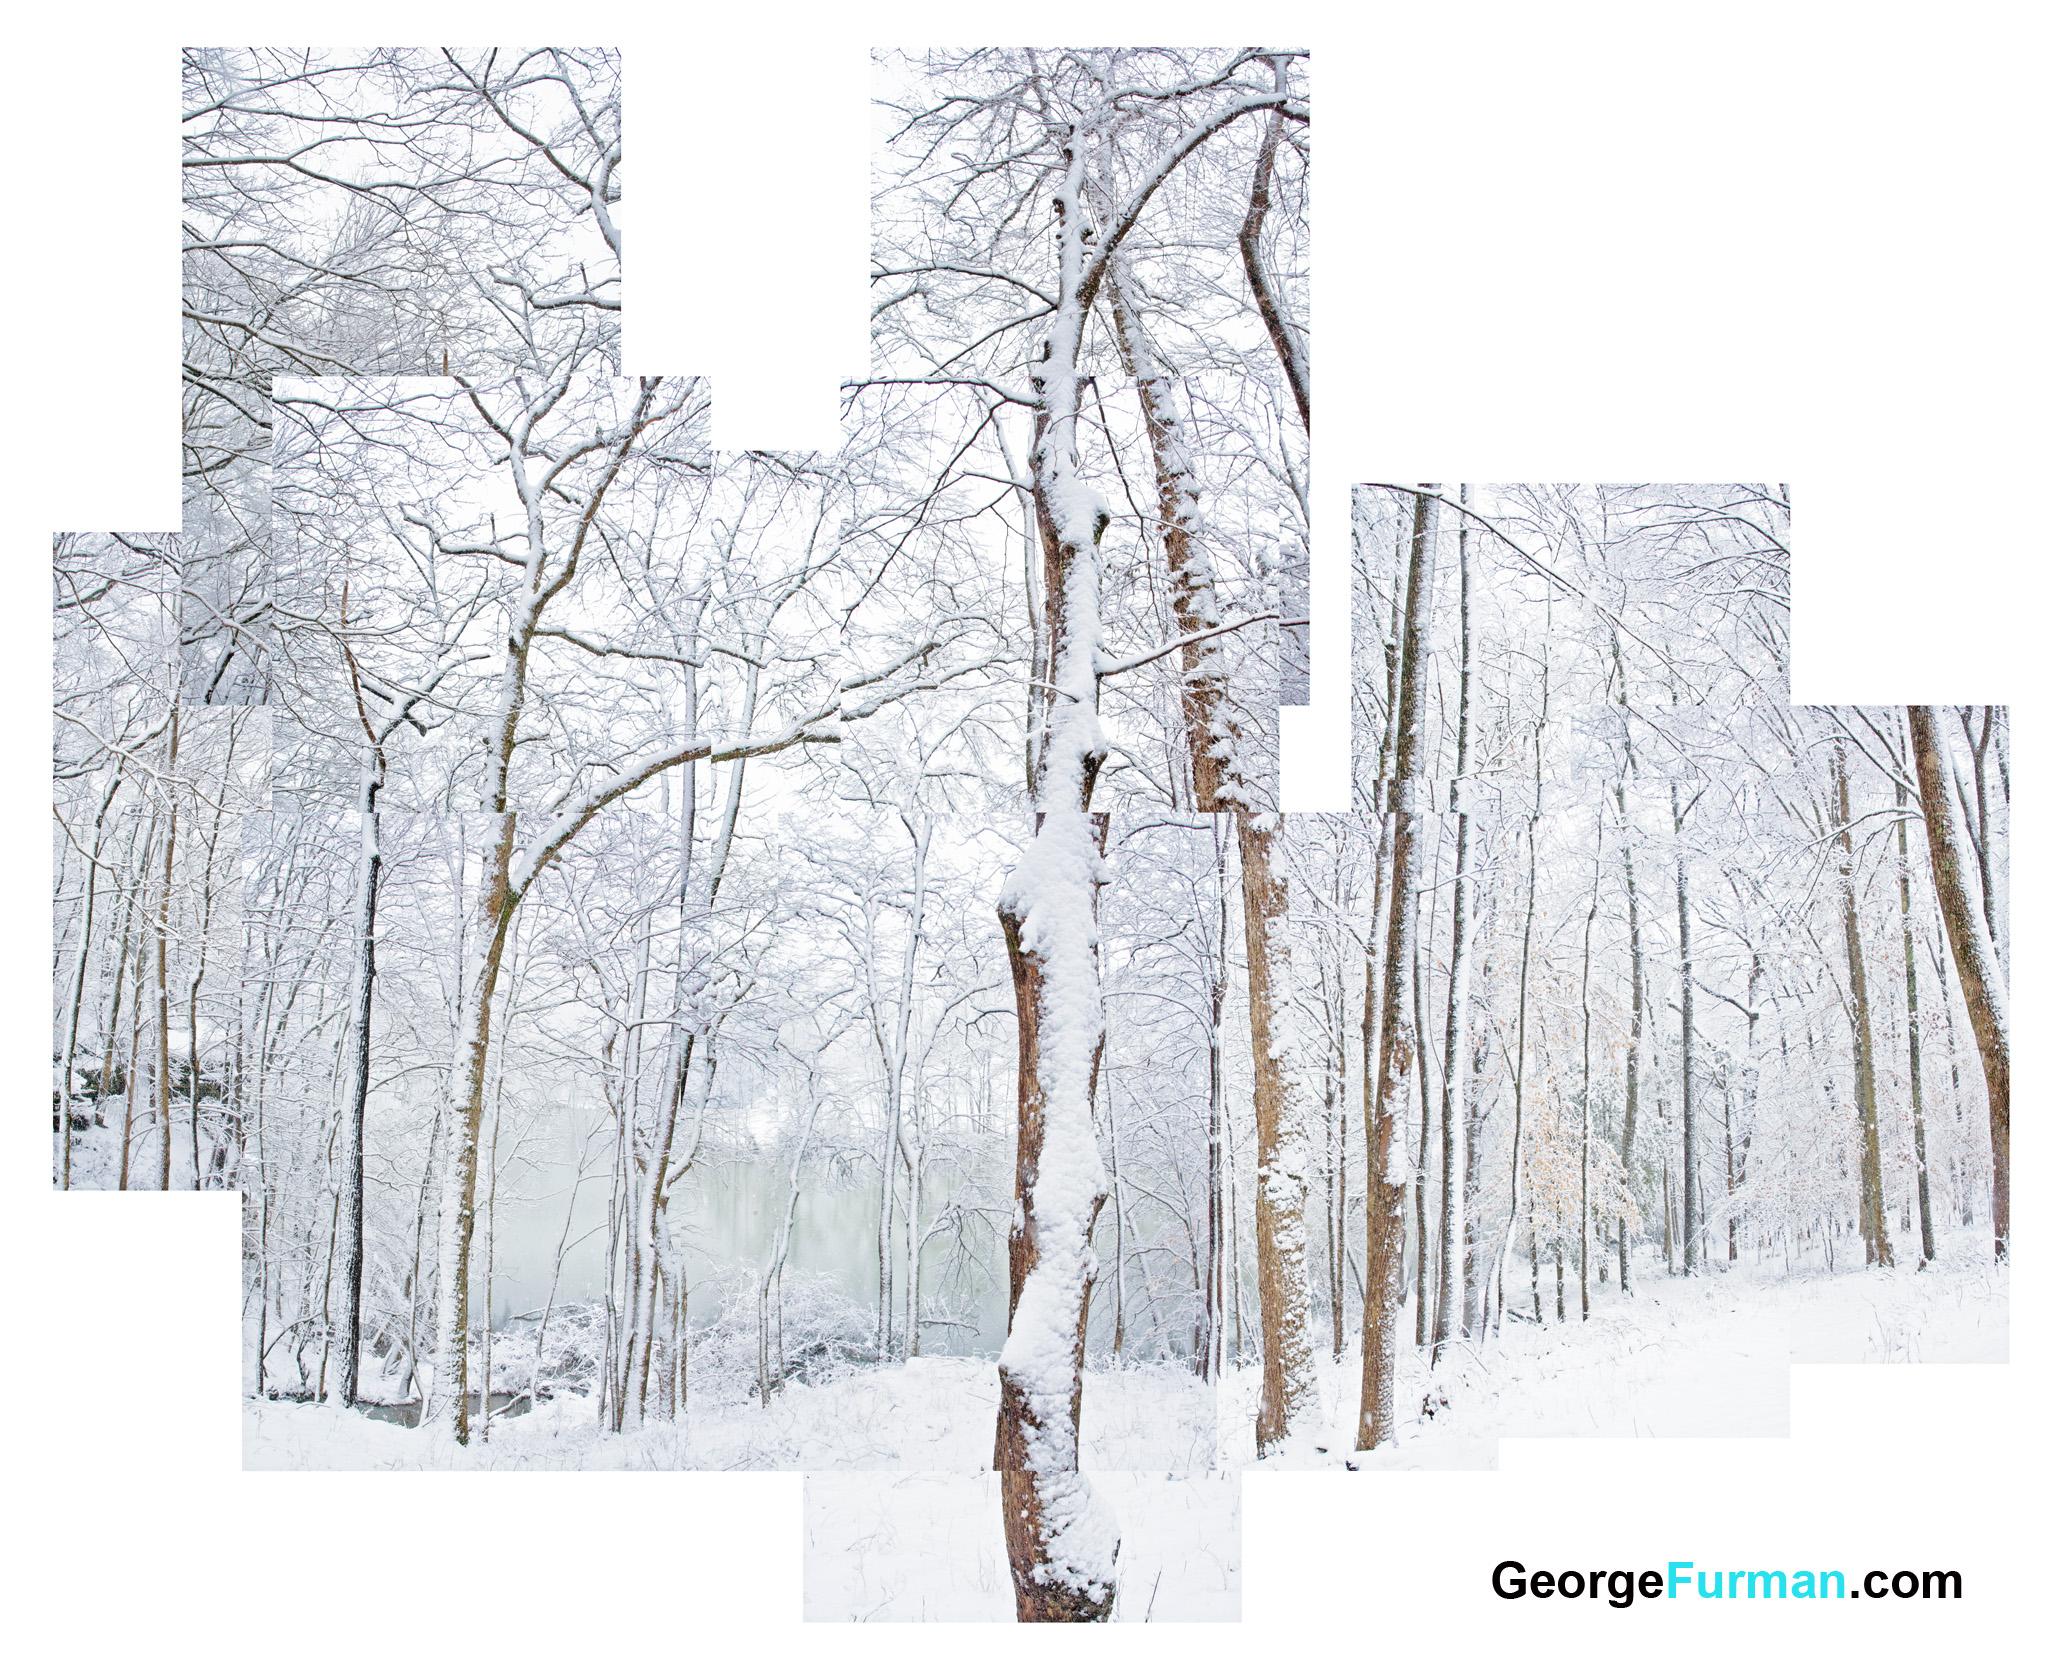 snow falling water jan 2016 2048.jpg